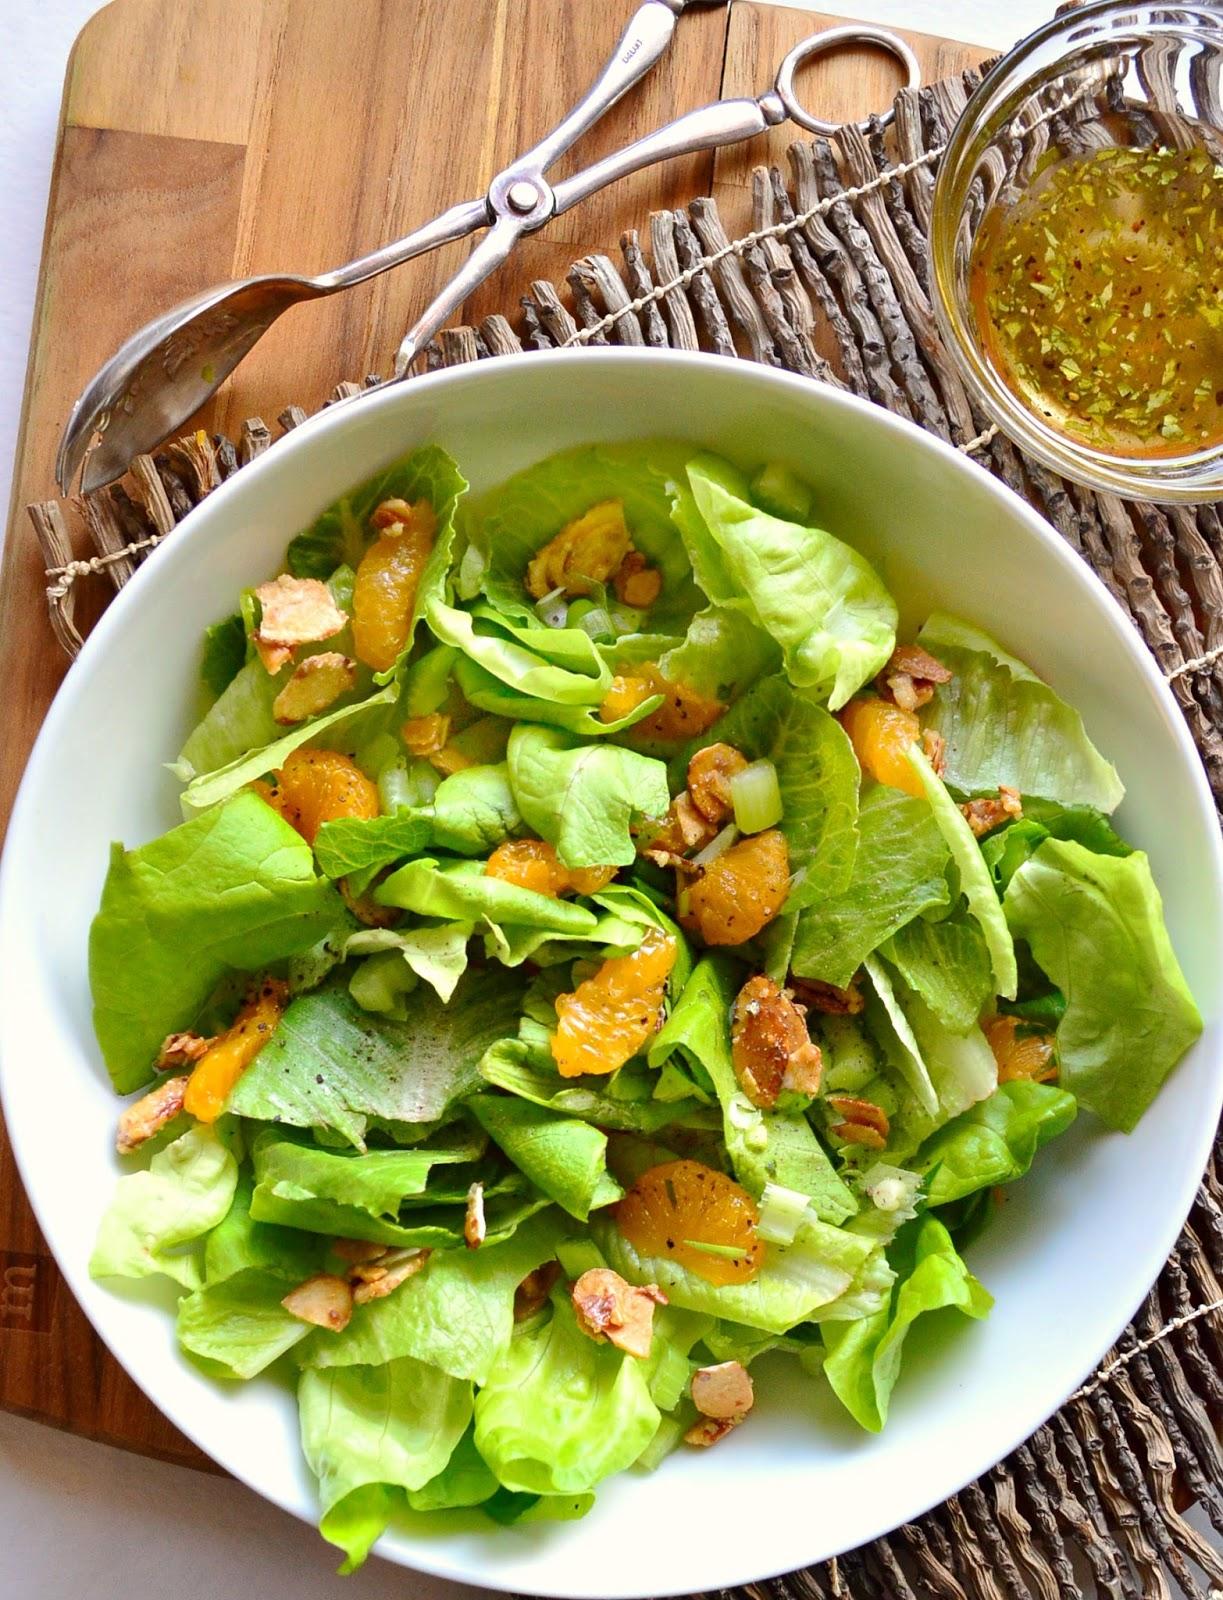 green salad mandarin oranges sugared almonds